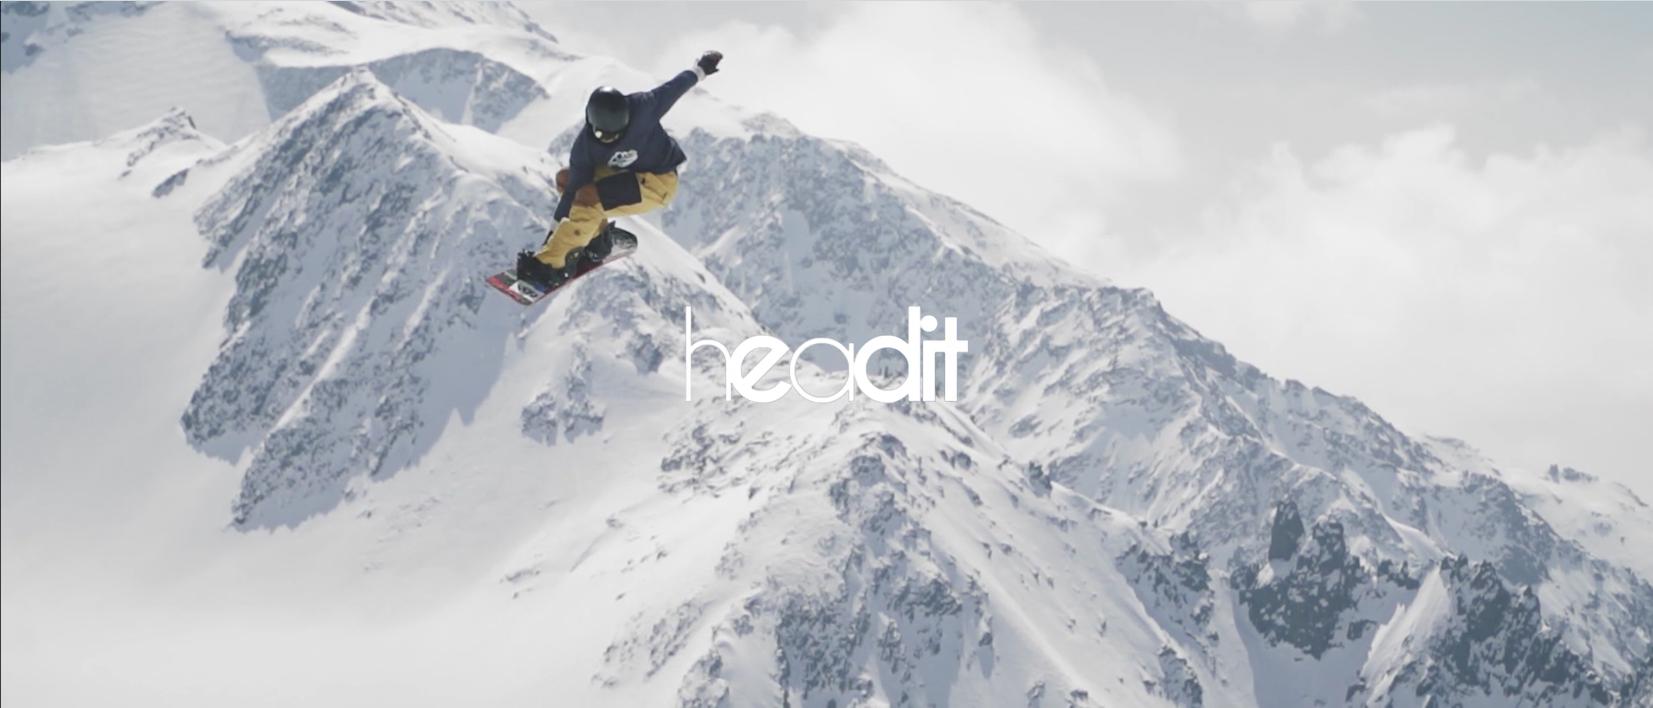 headit-blog